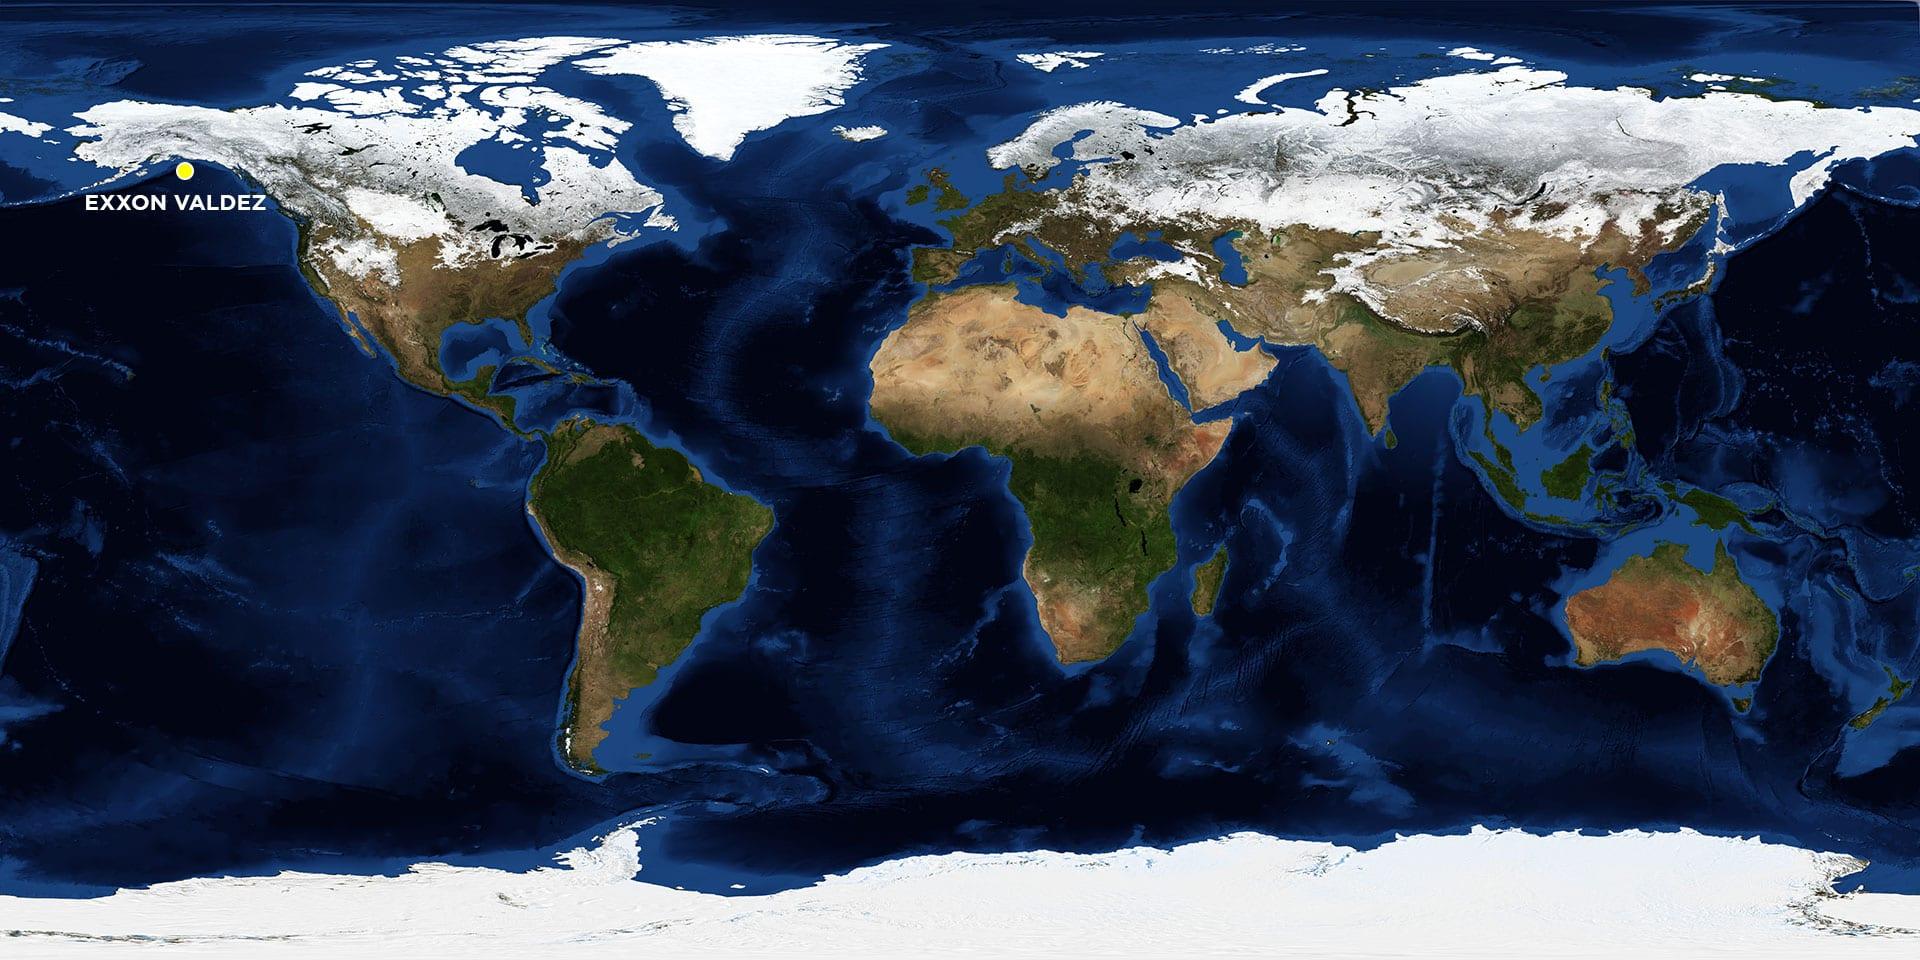 earth-oilspills-valdes